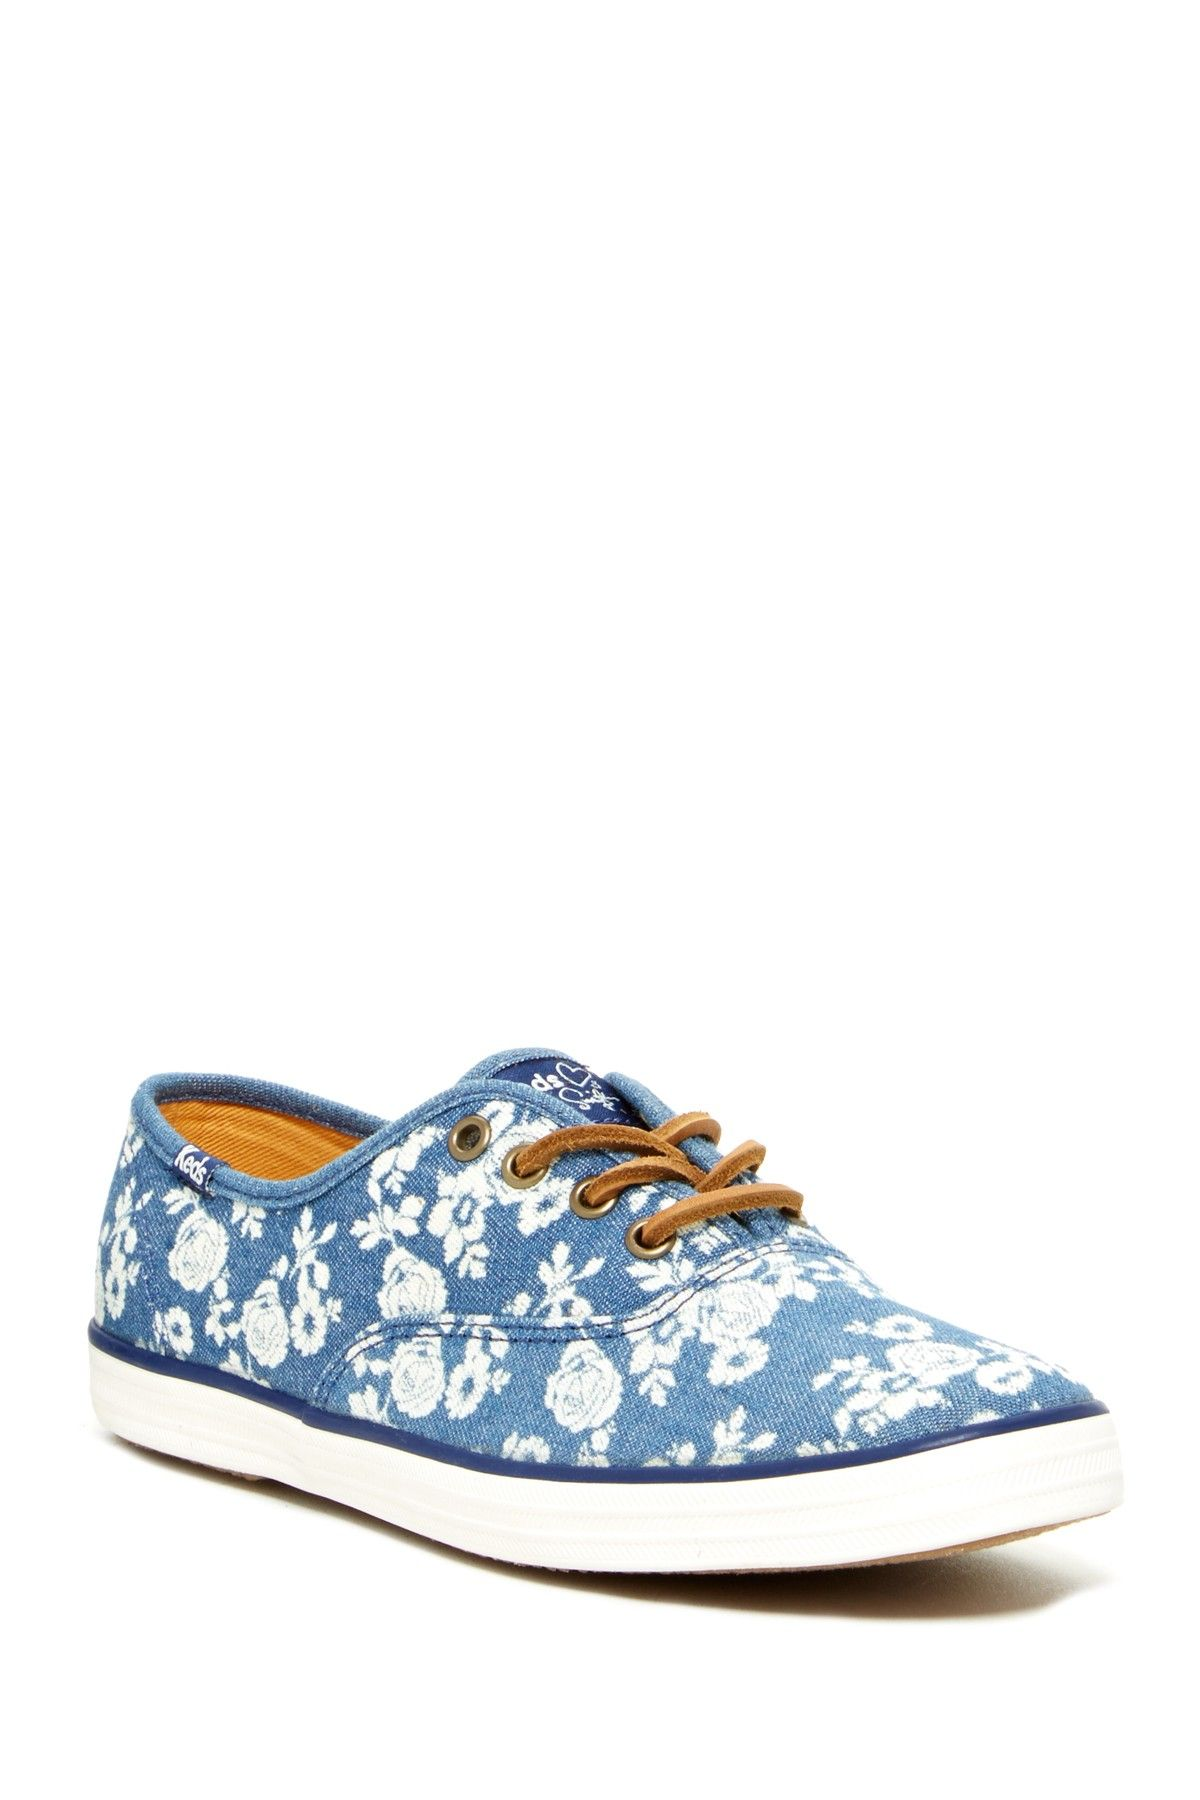 Love these keds floral sneaker hautelook jordan shoes